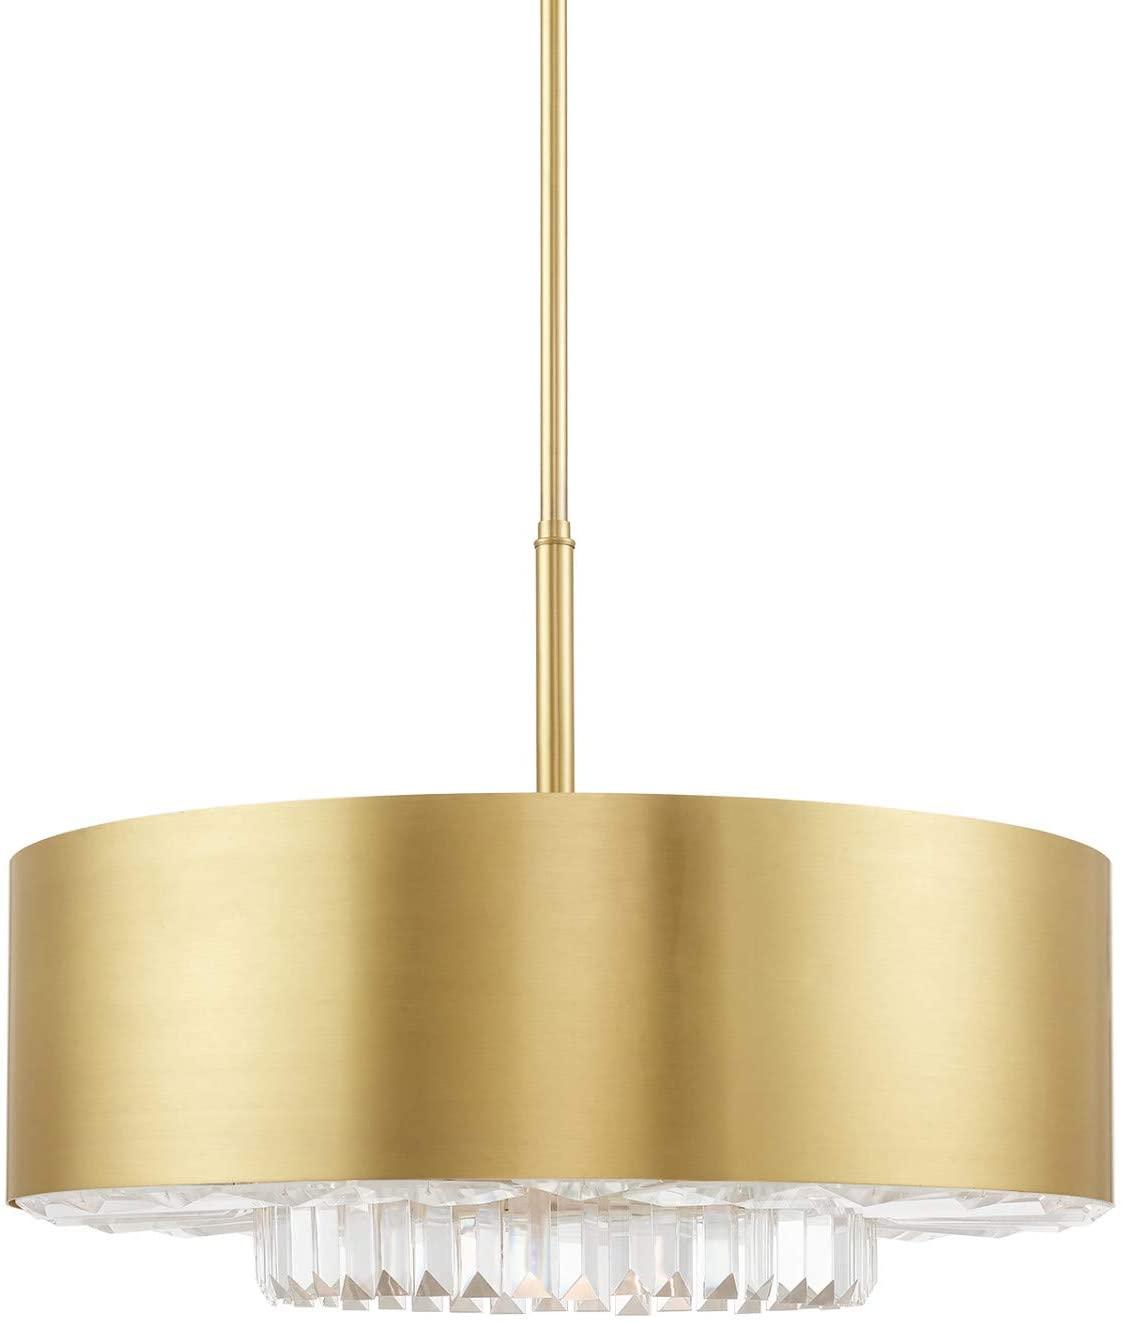 Livex Lighting 40020-12 Satin Brass 6 Lt Pendant Chandelier